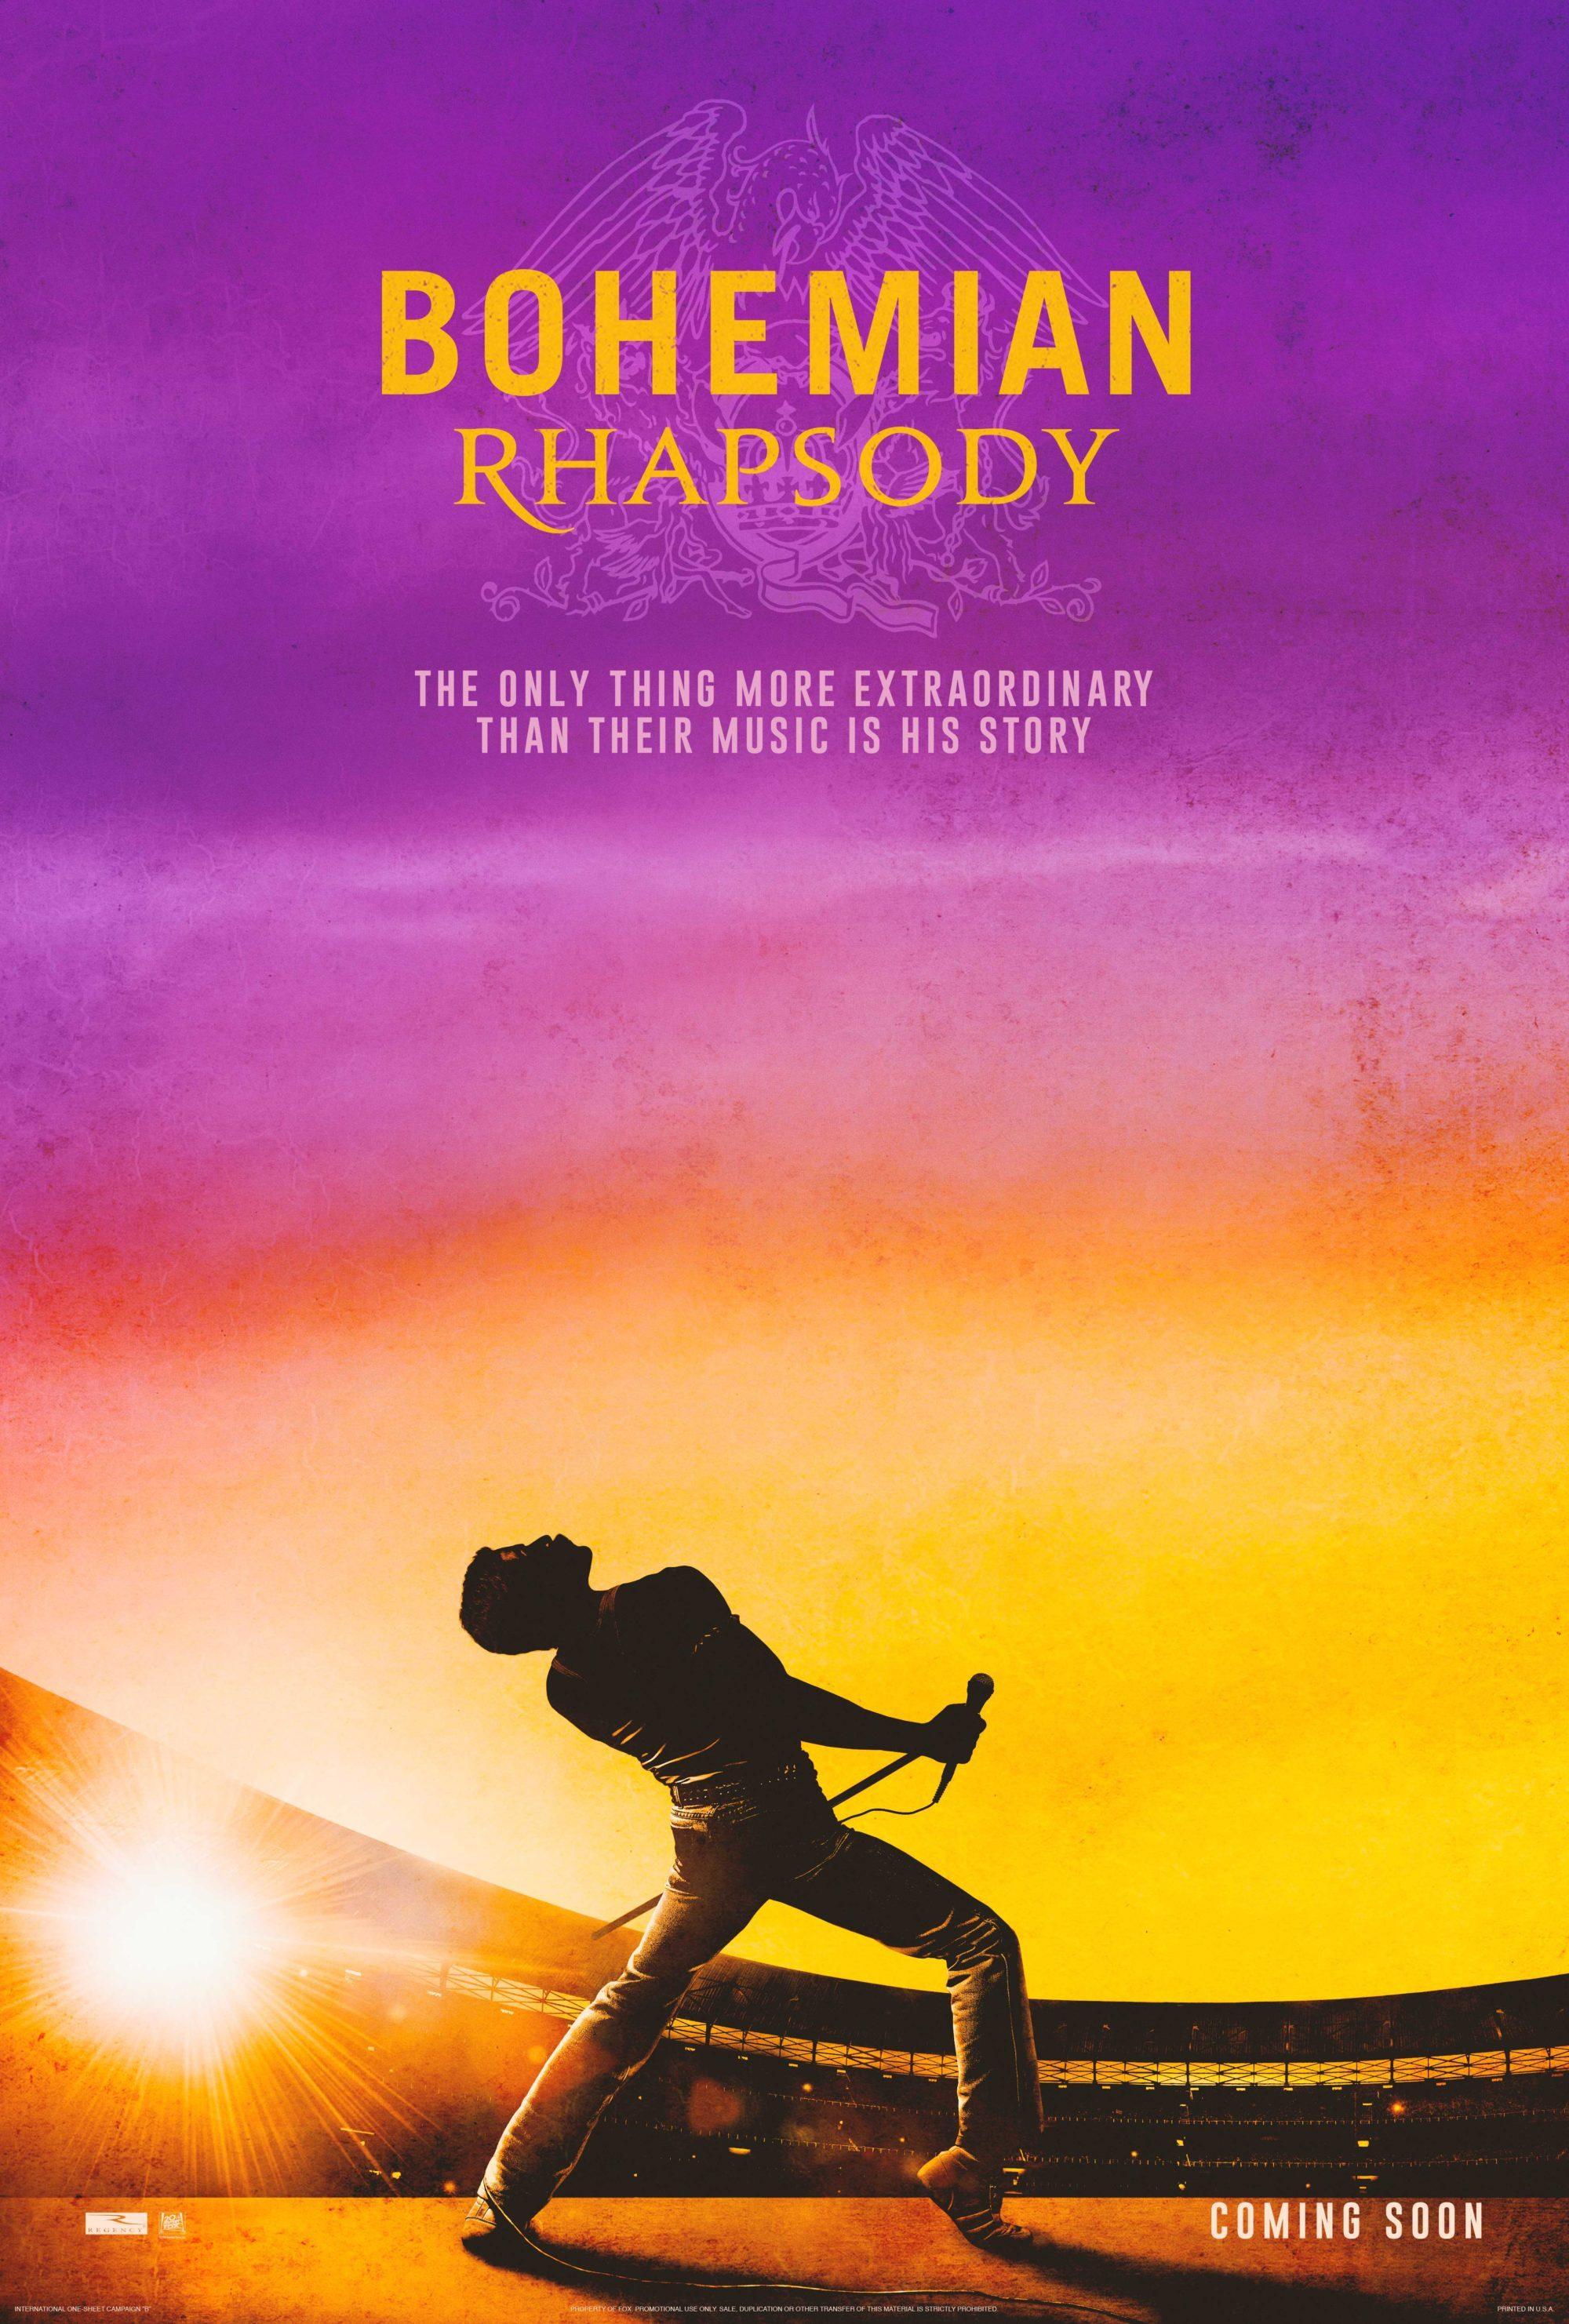 Bohemian Rhapsody Teaser Poster 2